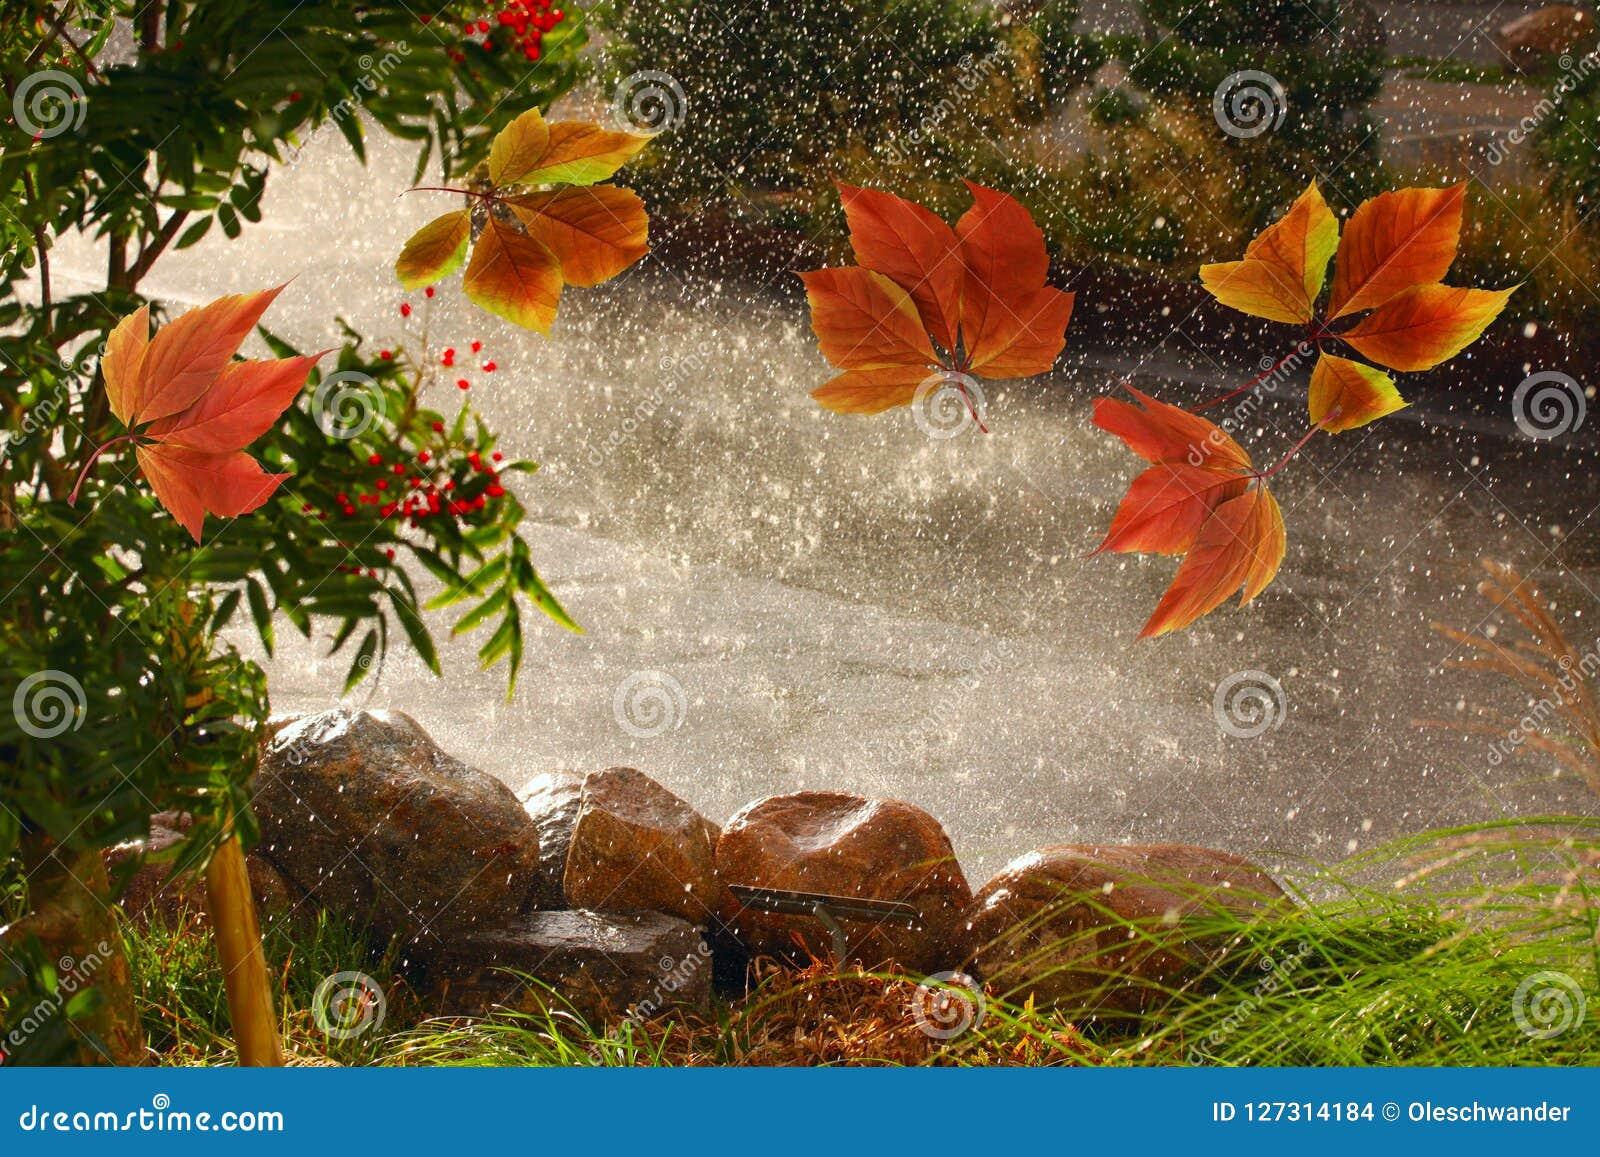 Höstsidor som omkring blåser i vinden regnar jag, väder